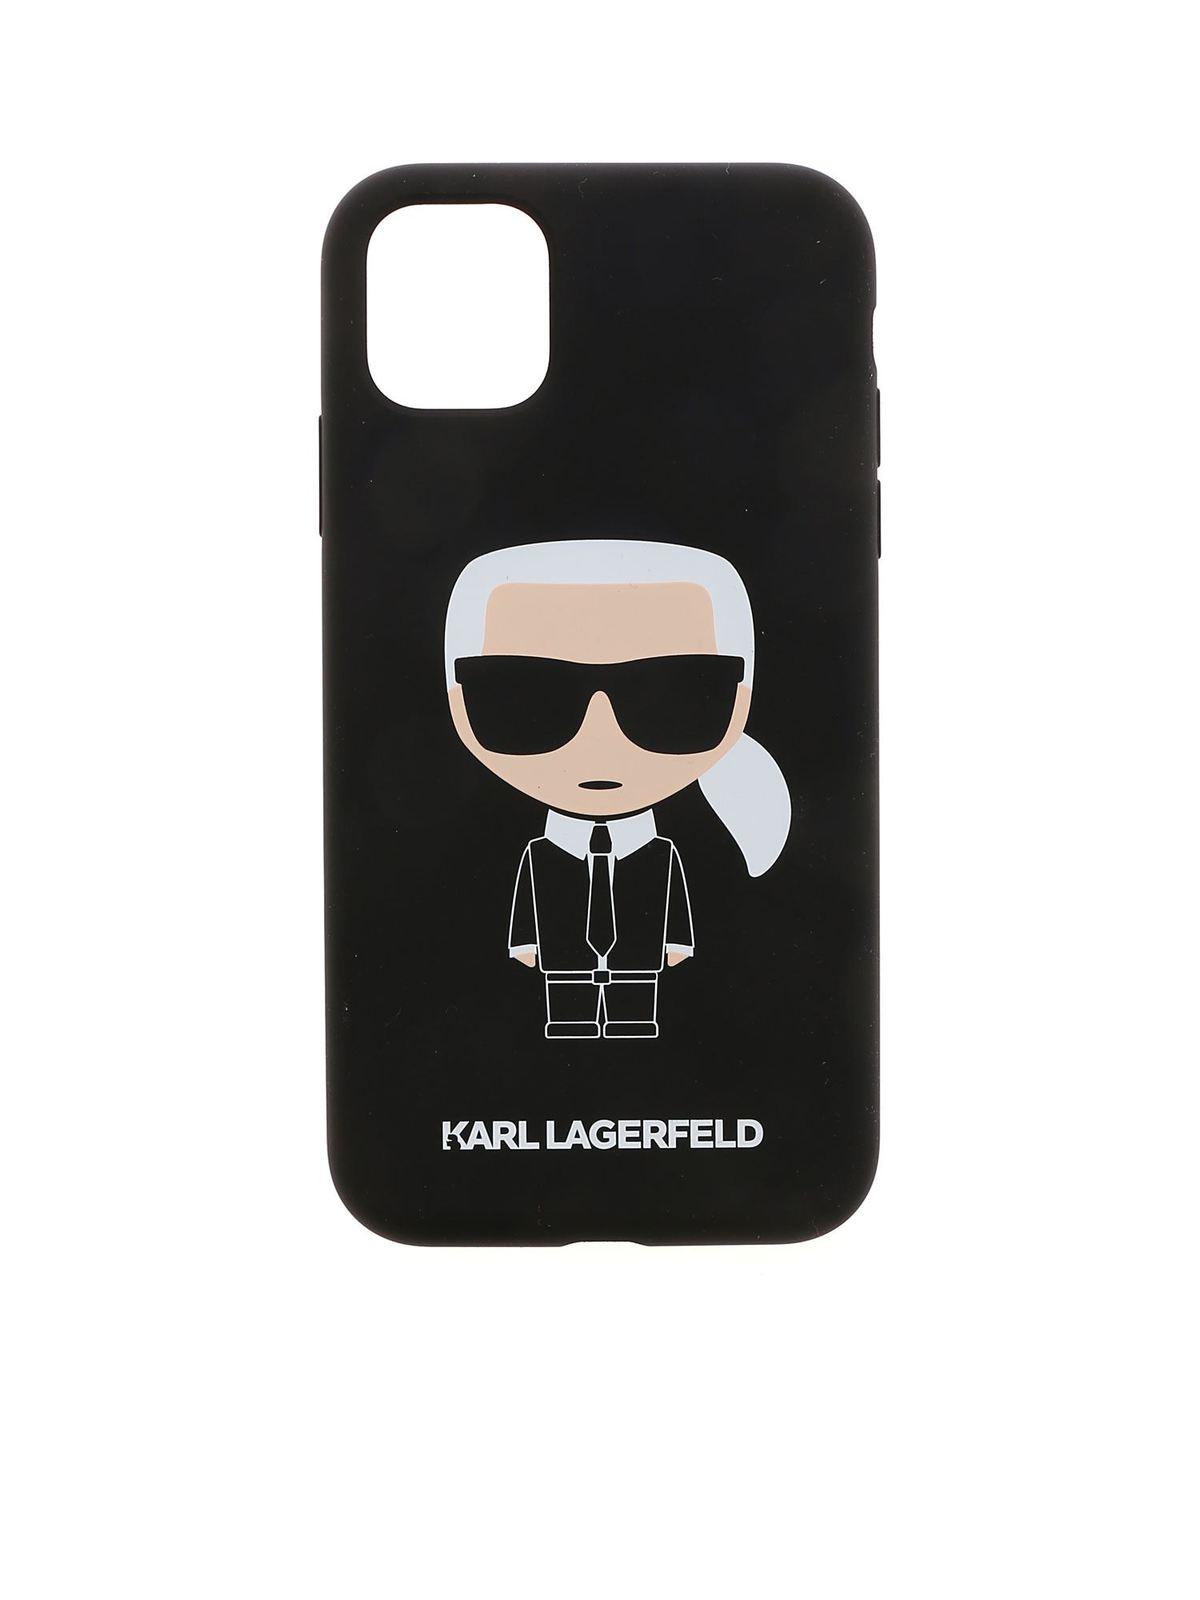 Karl Lagerfeld K IKONIC IPHONE 11 CASE IN BLACK